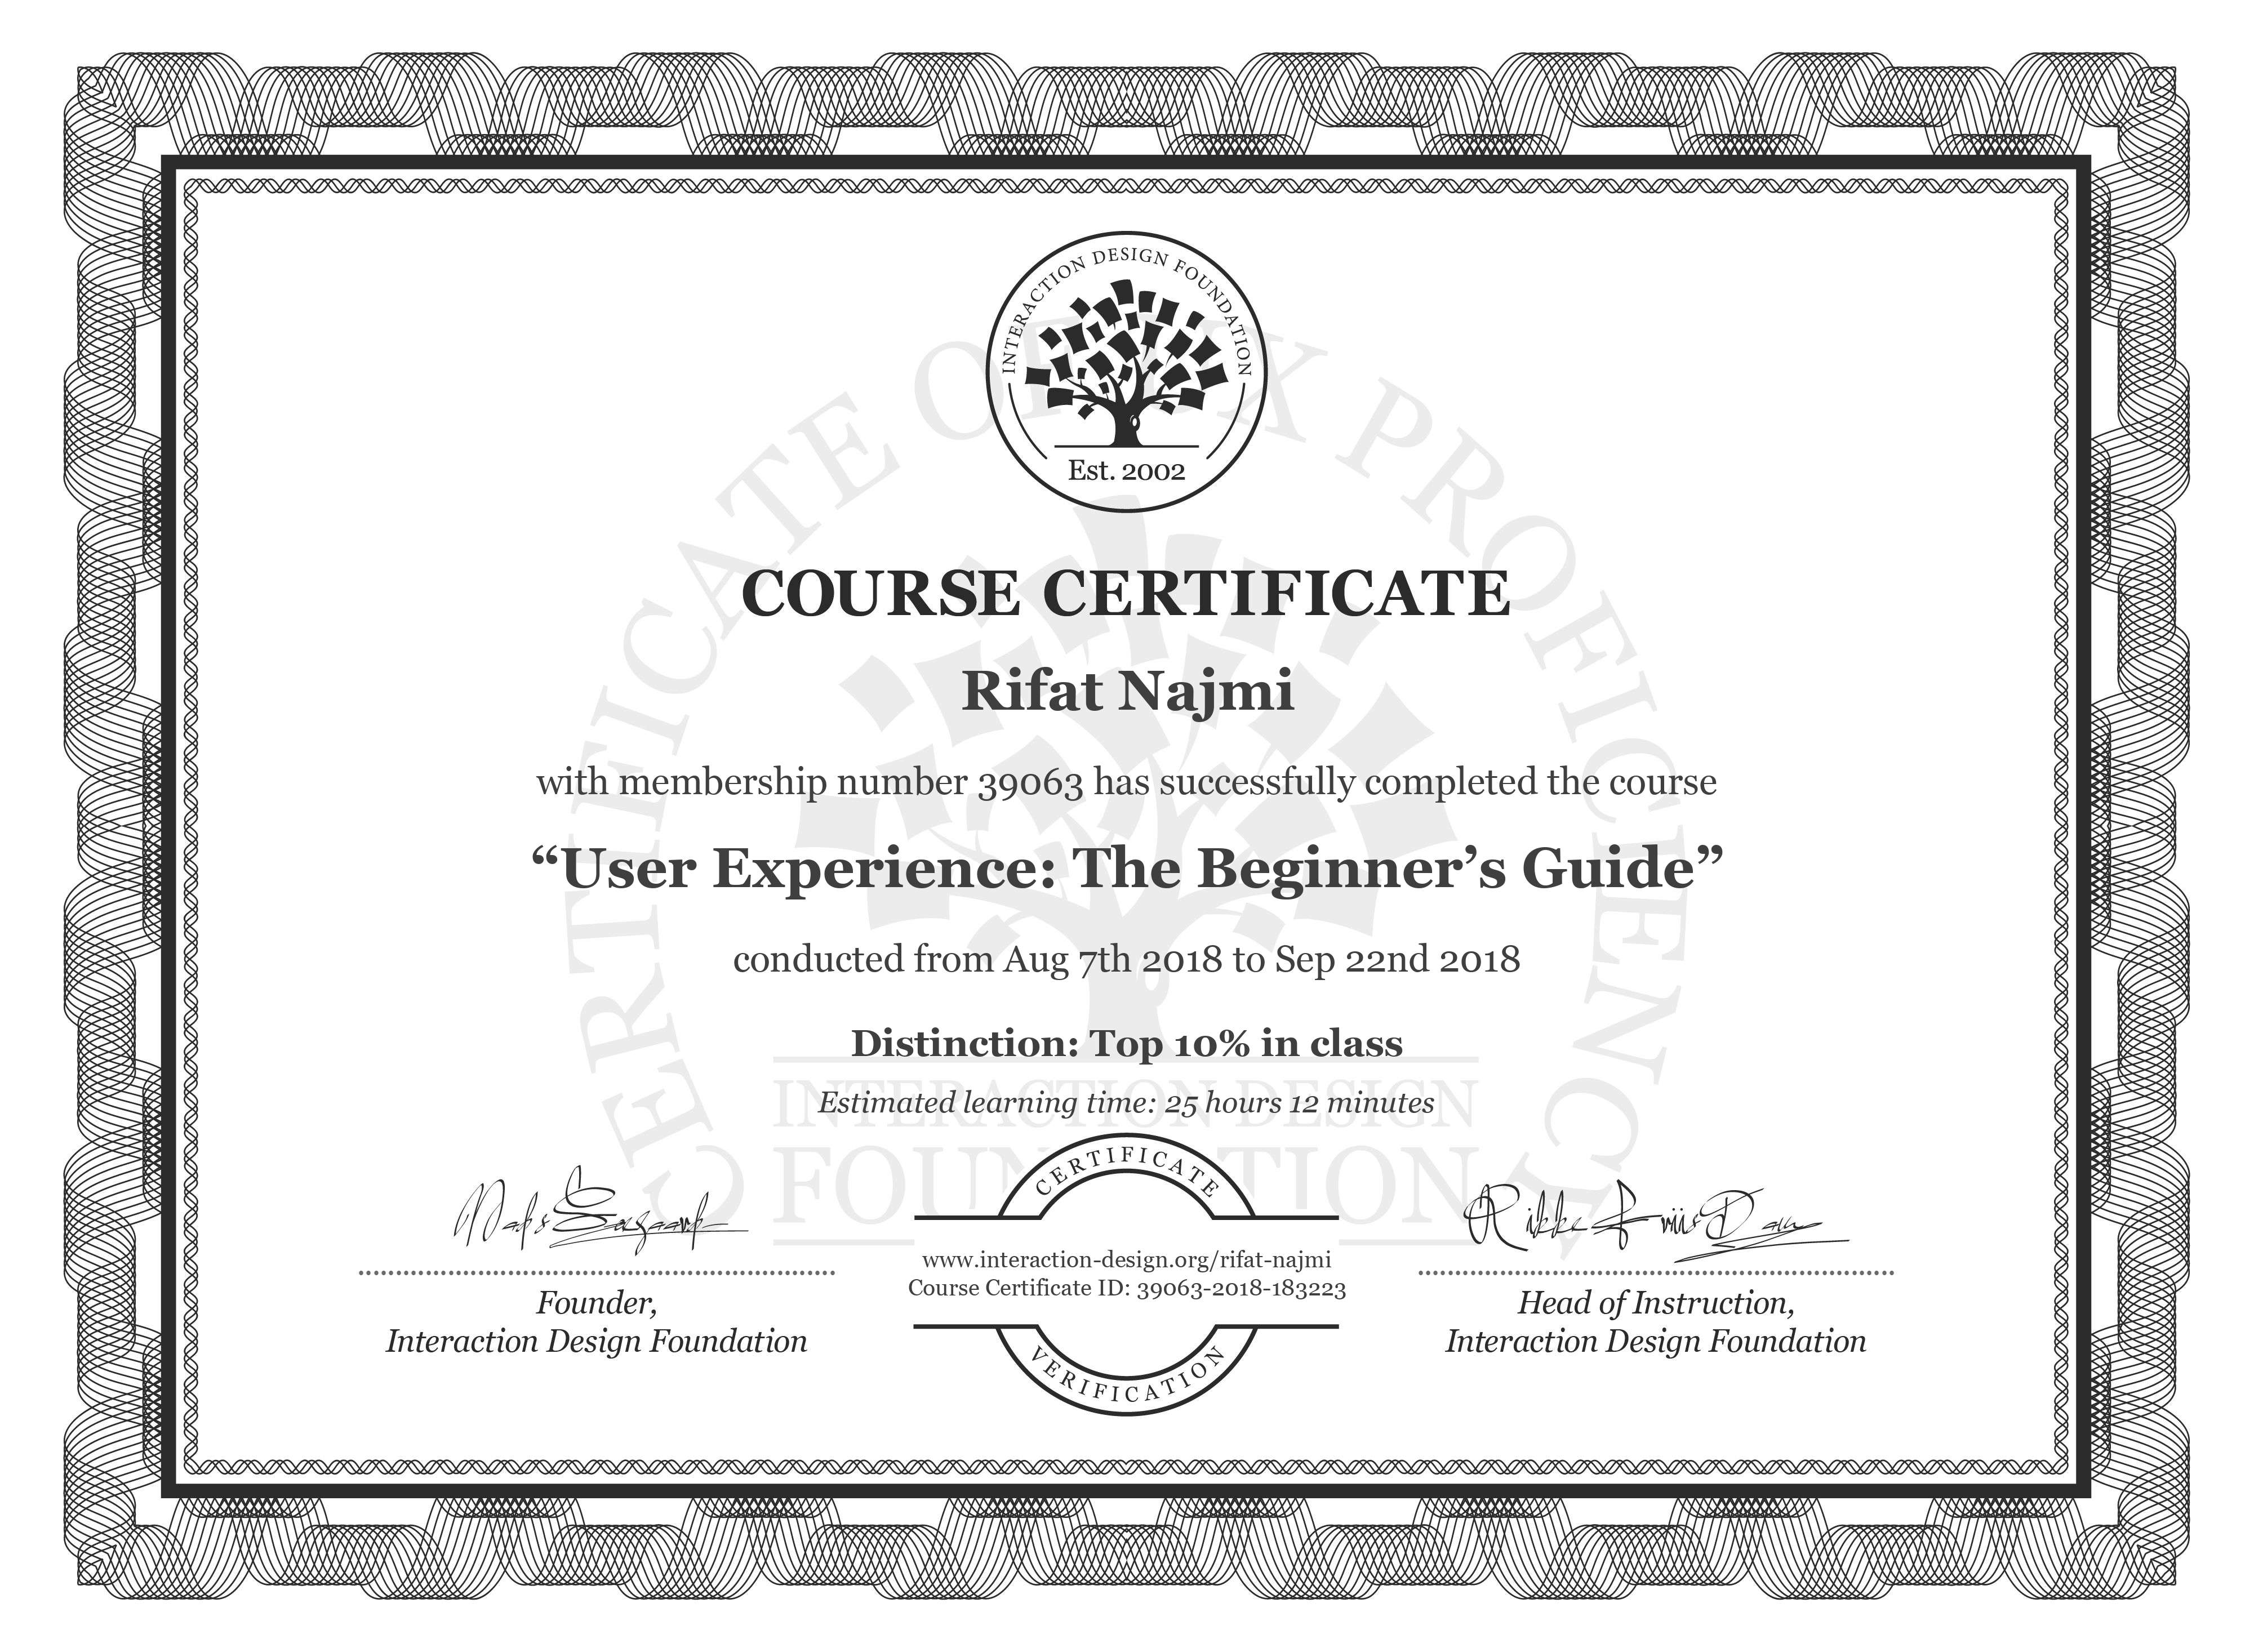 Rifat Najmi's Course Certificate: Become a UX Designer from Scratch